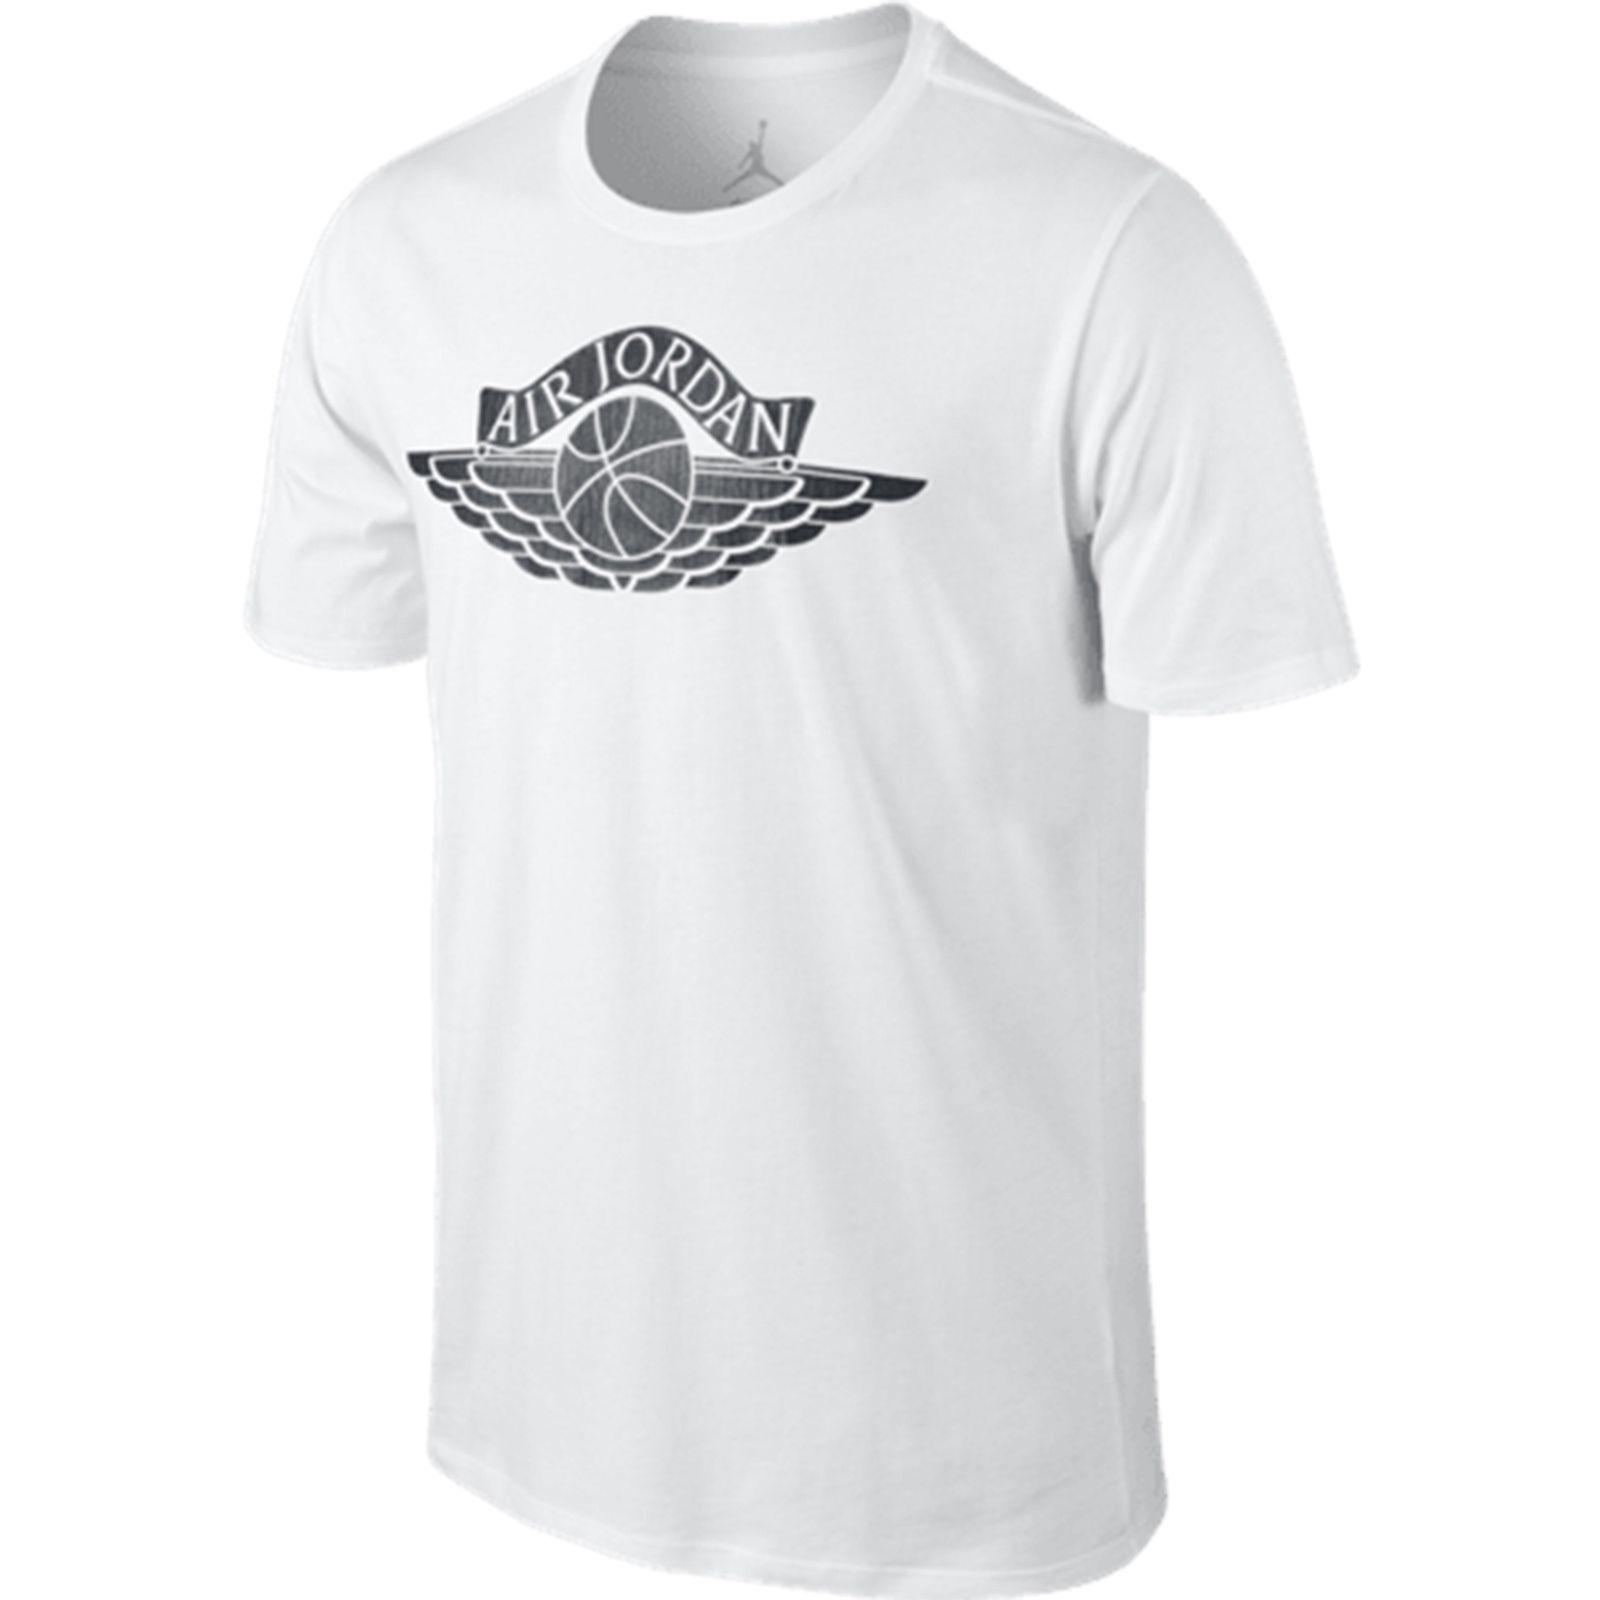 Cool Brand New Air Jordan 1 Wings T-Shirt Men's Fashion Apparel 2017-2018